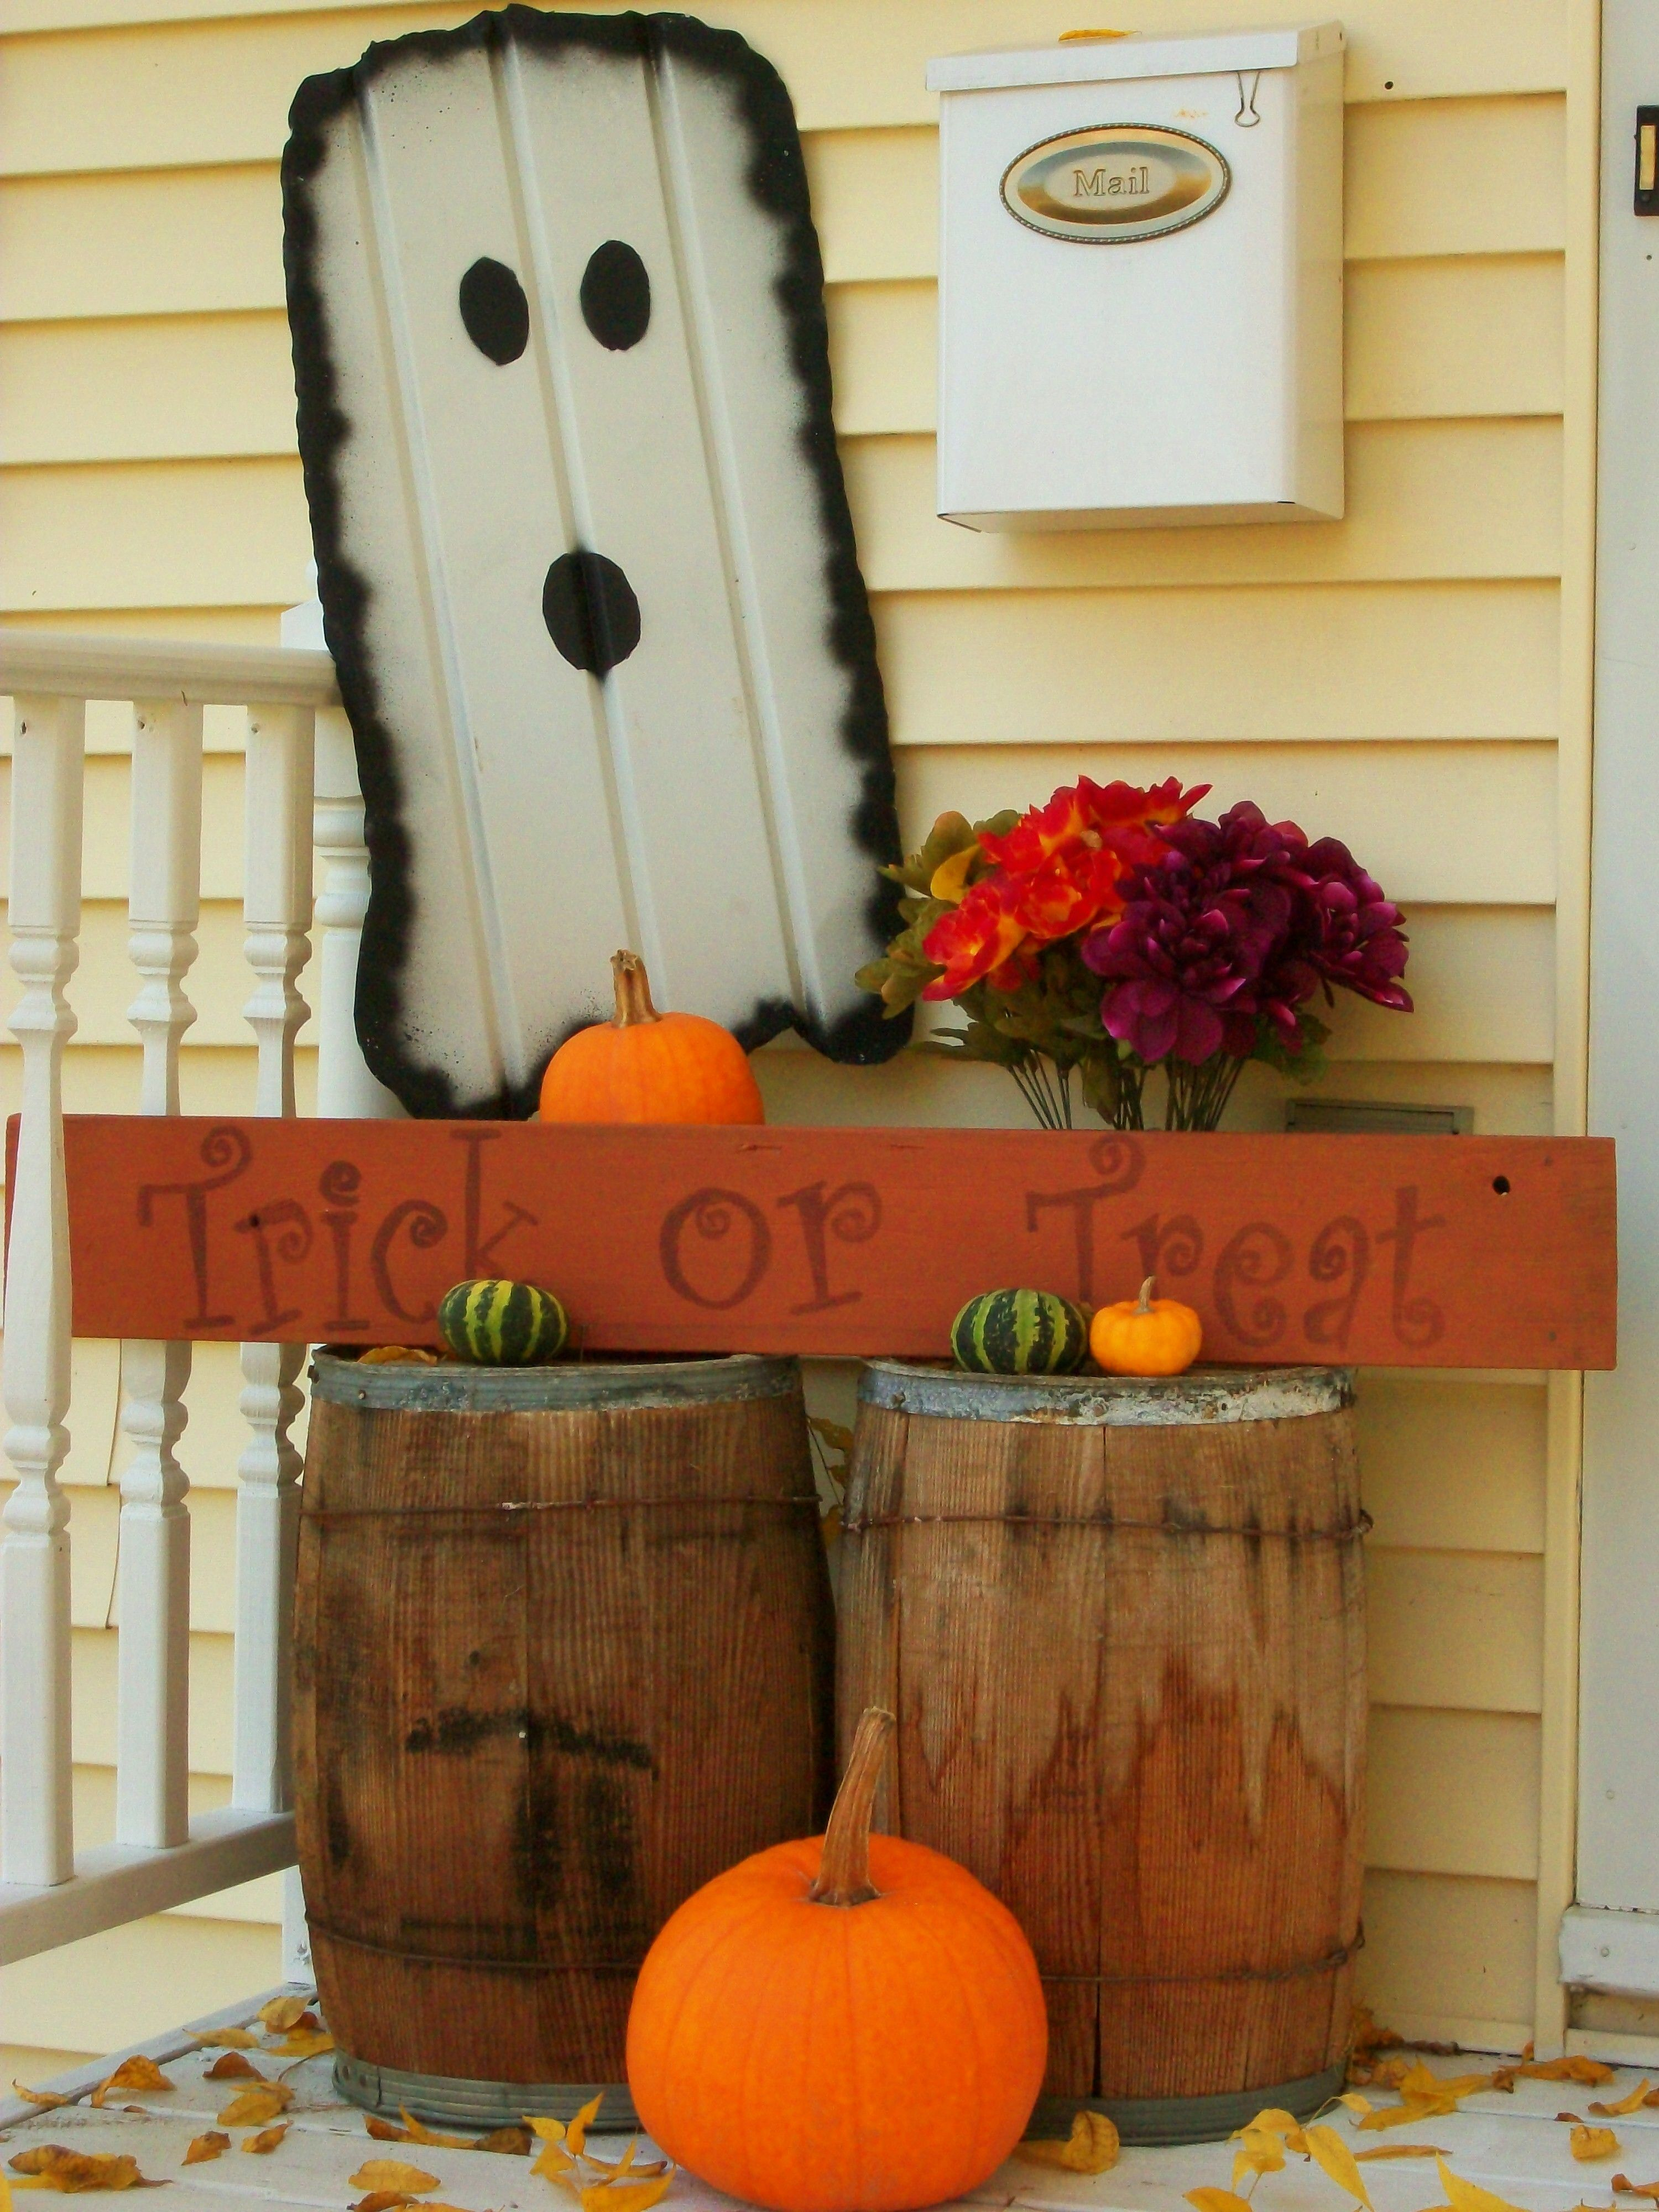 DIY Trick or Treat Sign Halloween food decorations